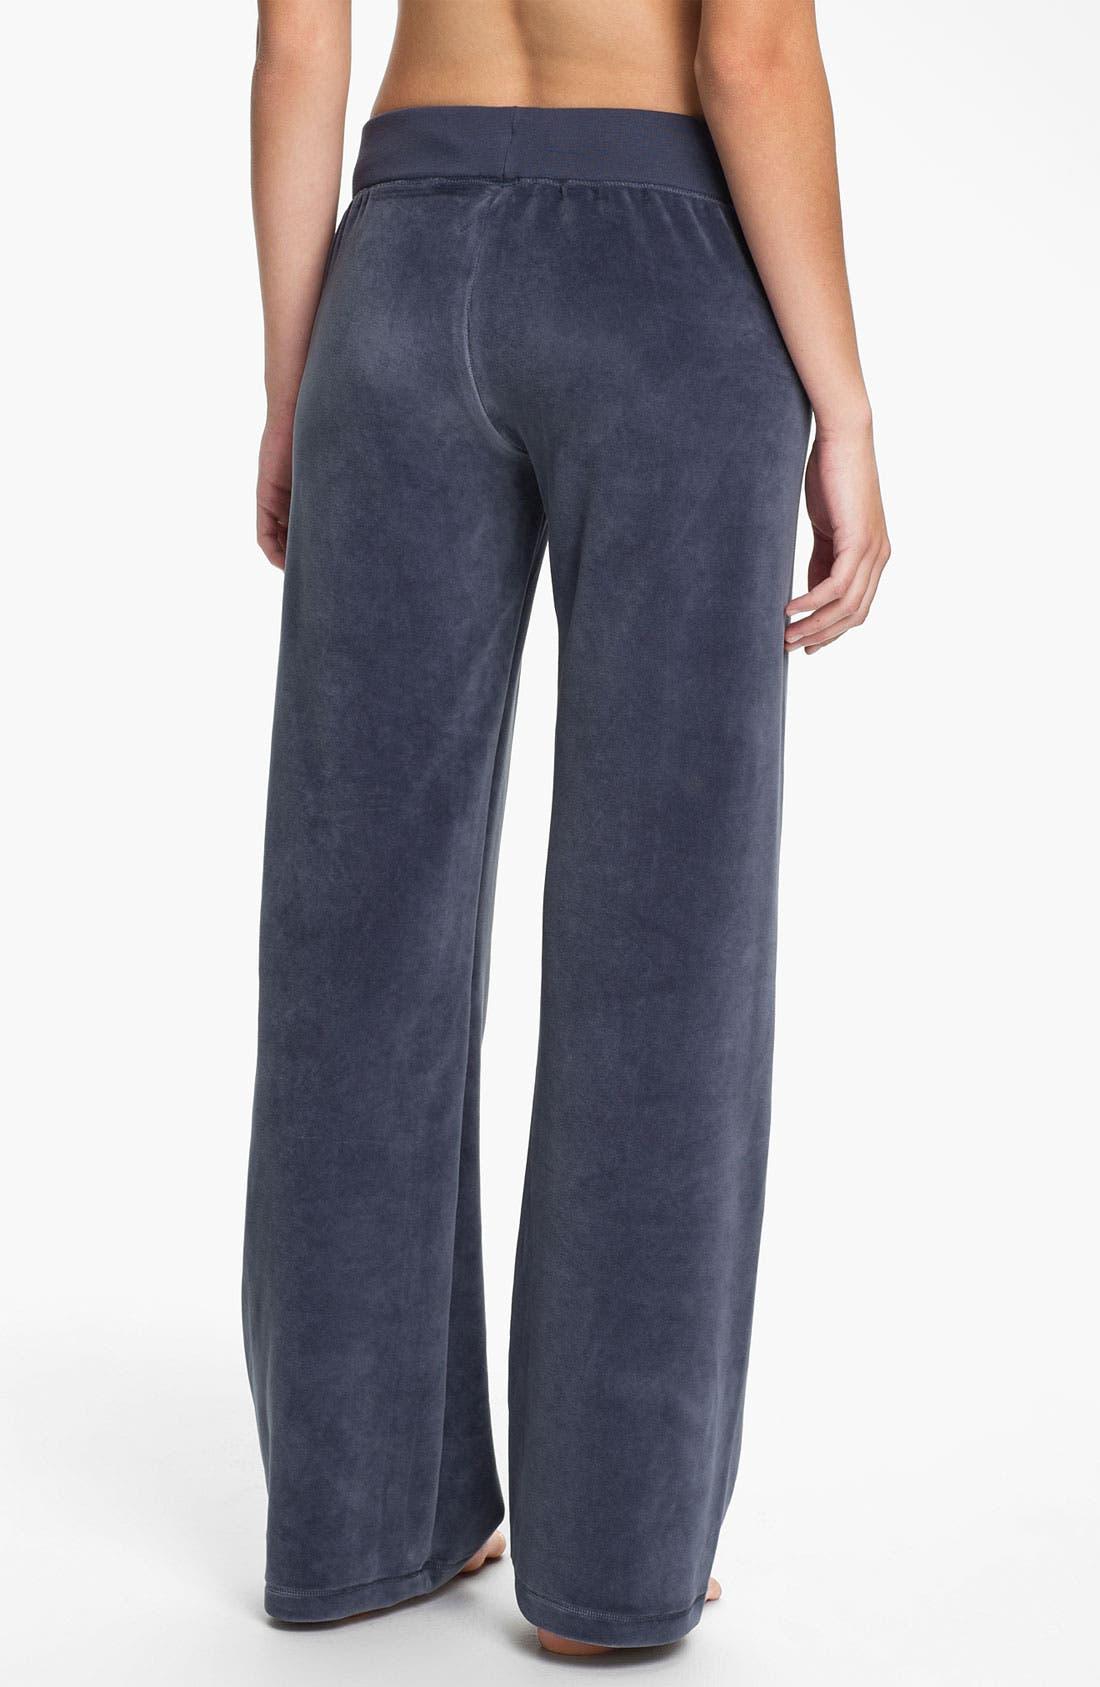 Alternate Image 2  - Nike 'Oh' Velour Pants